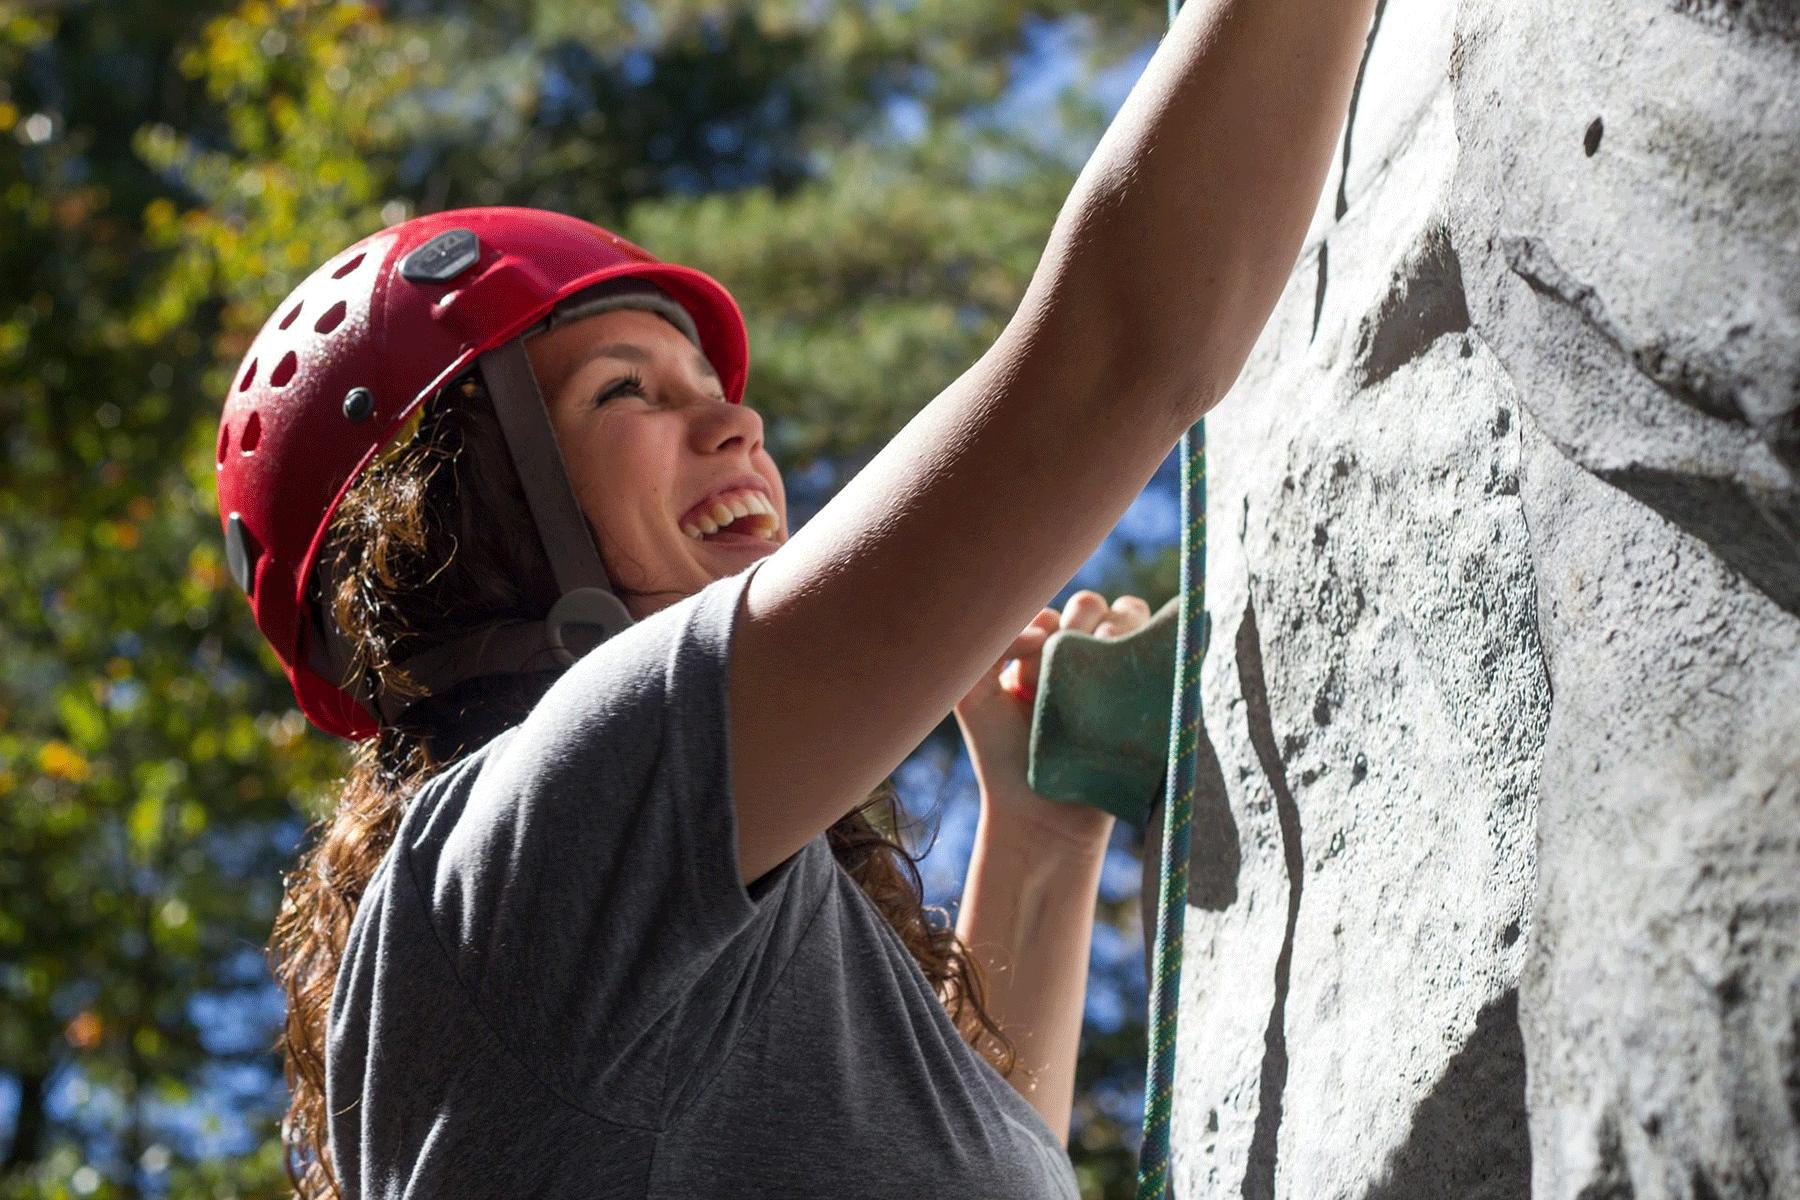 Frau beim Klettern Alpbachtal